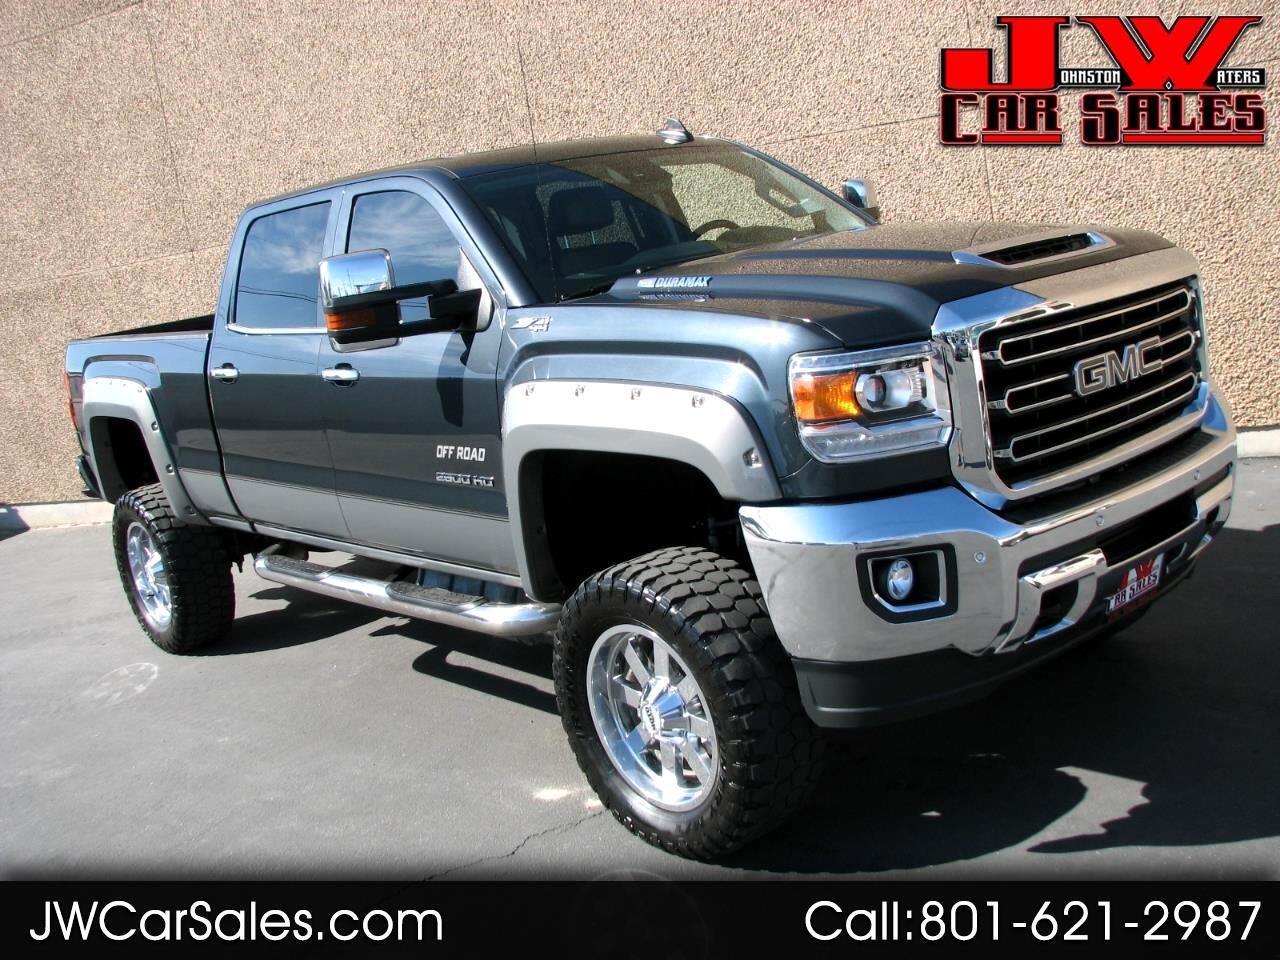 Jw Auto Sales >> Used Cars For Sale Ogden Ut 84401 Jw Car Sales Inc